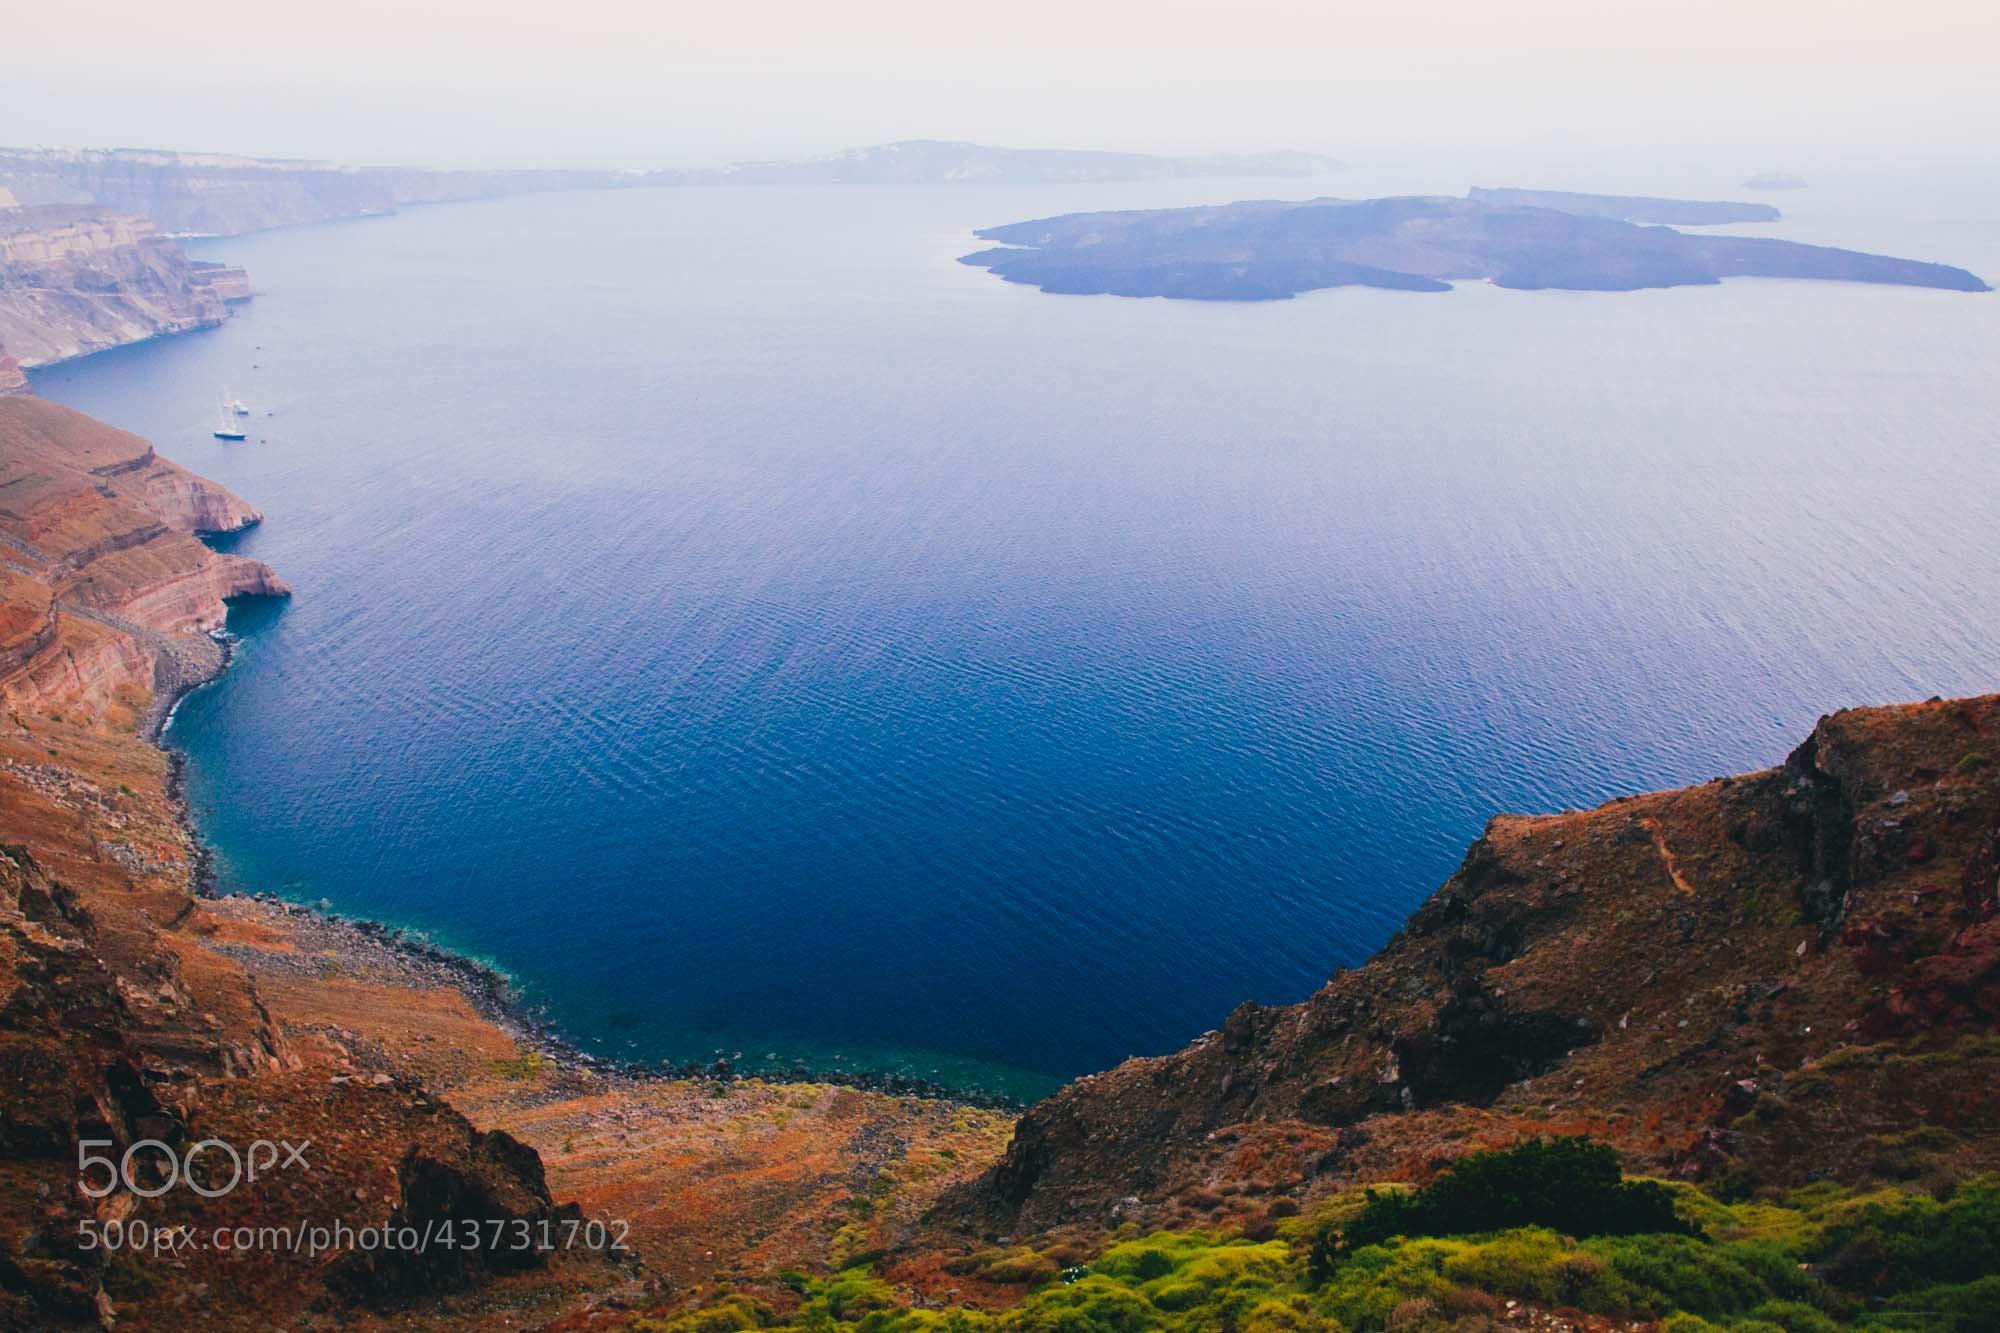 Photograph Santorini by Brian Furbush on 500px